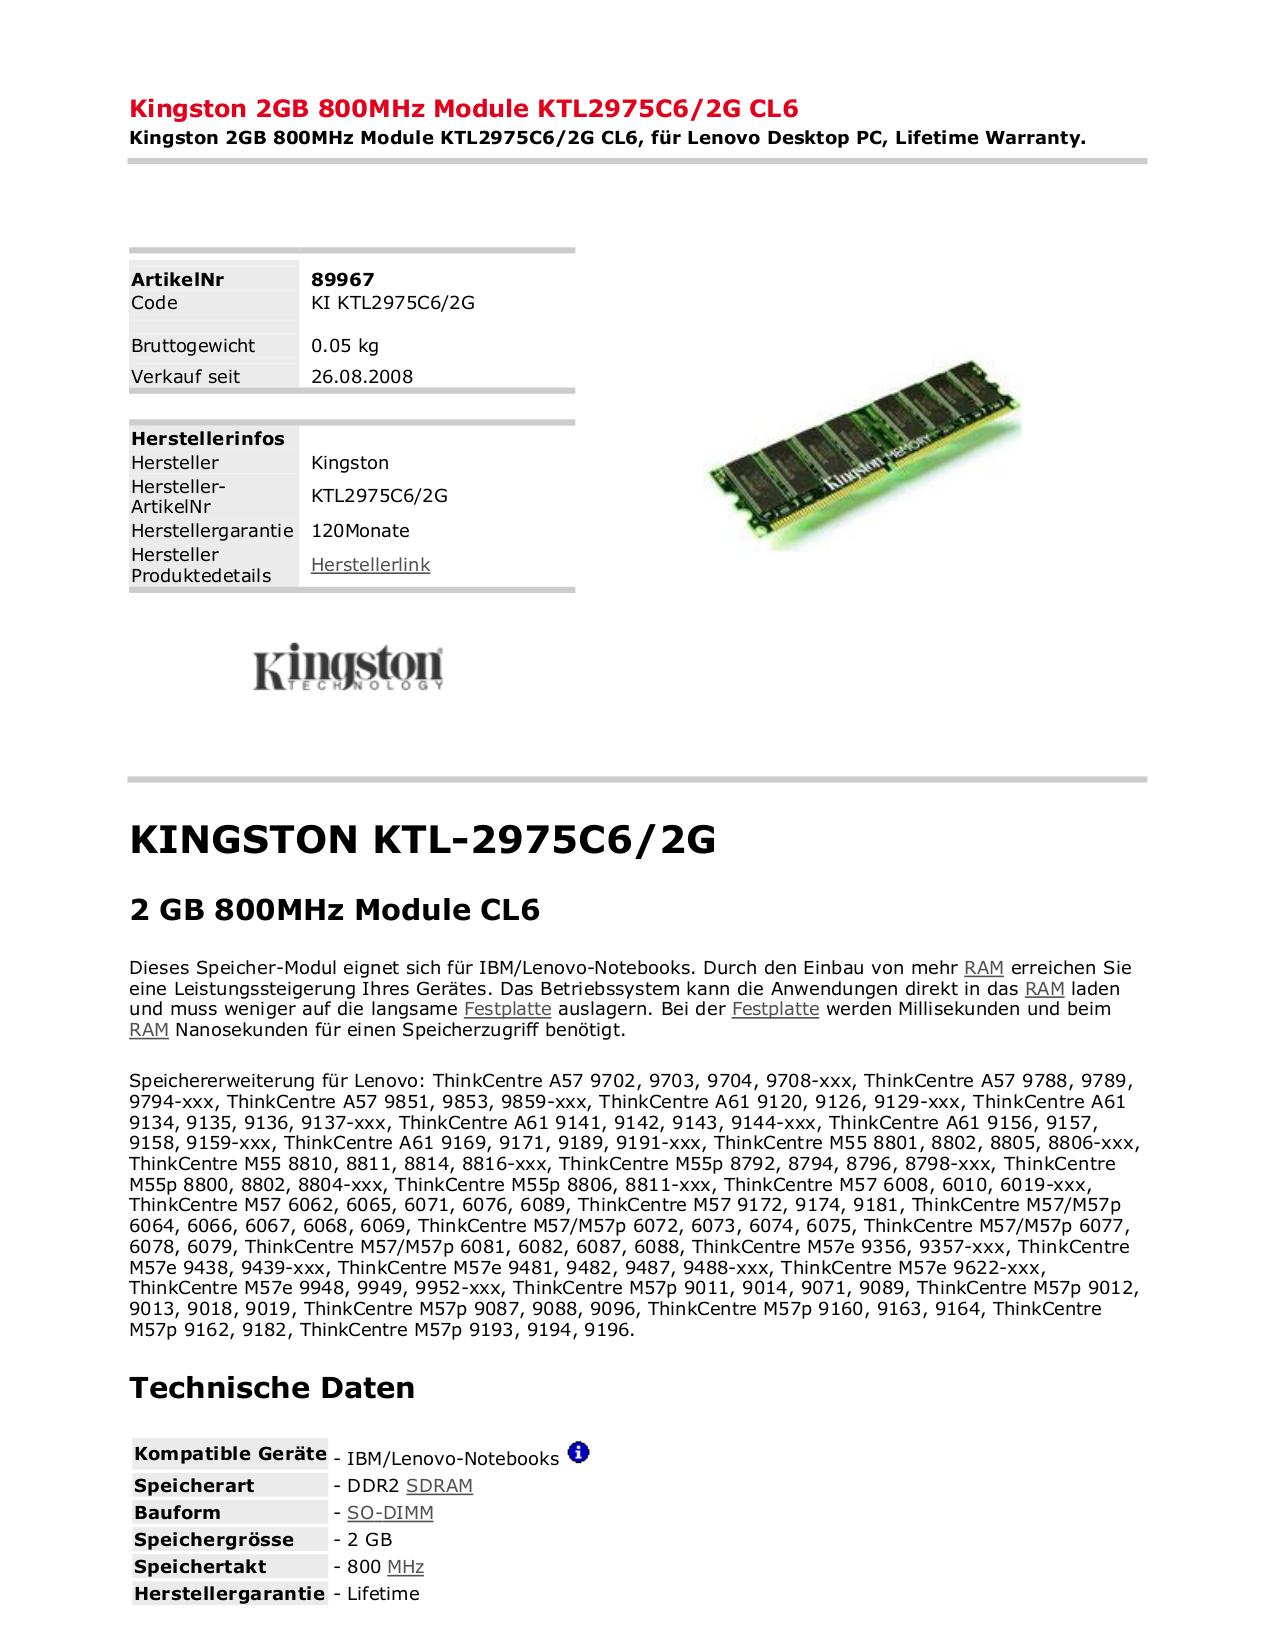 pdf for Lenovo Desktop ThinkCentre A57 9708 manual